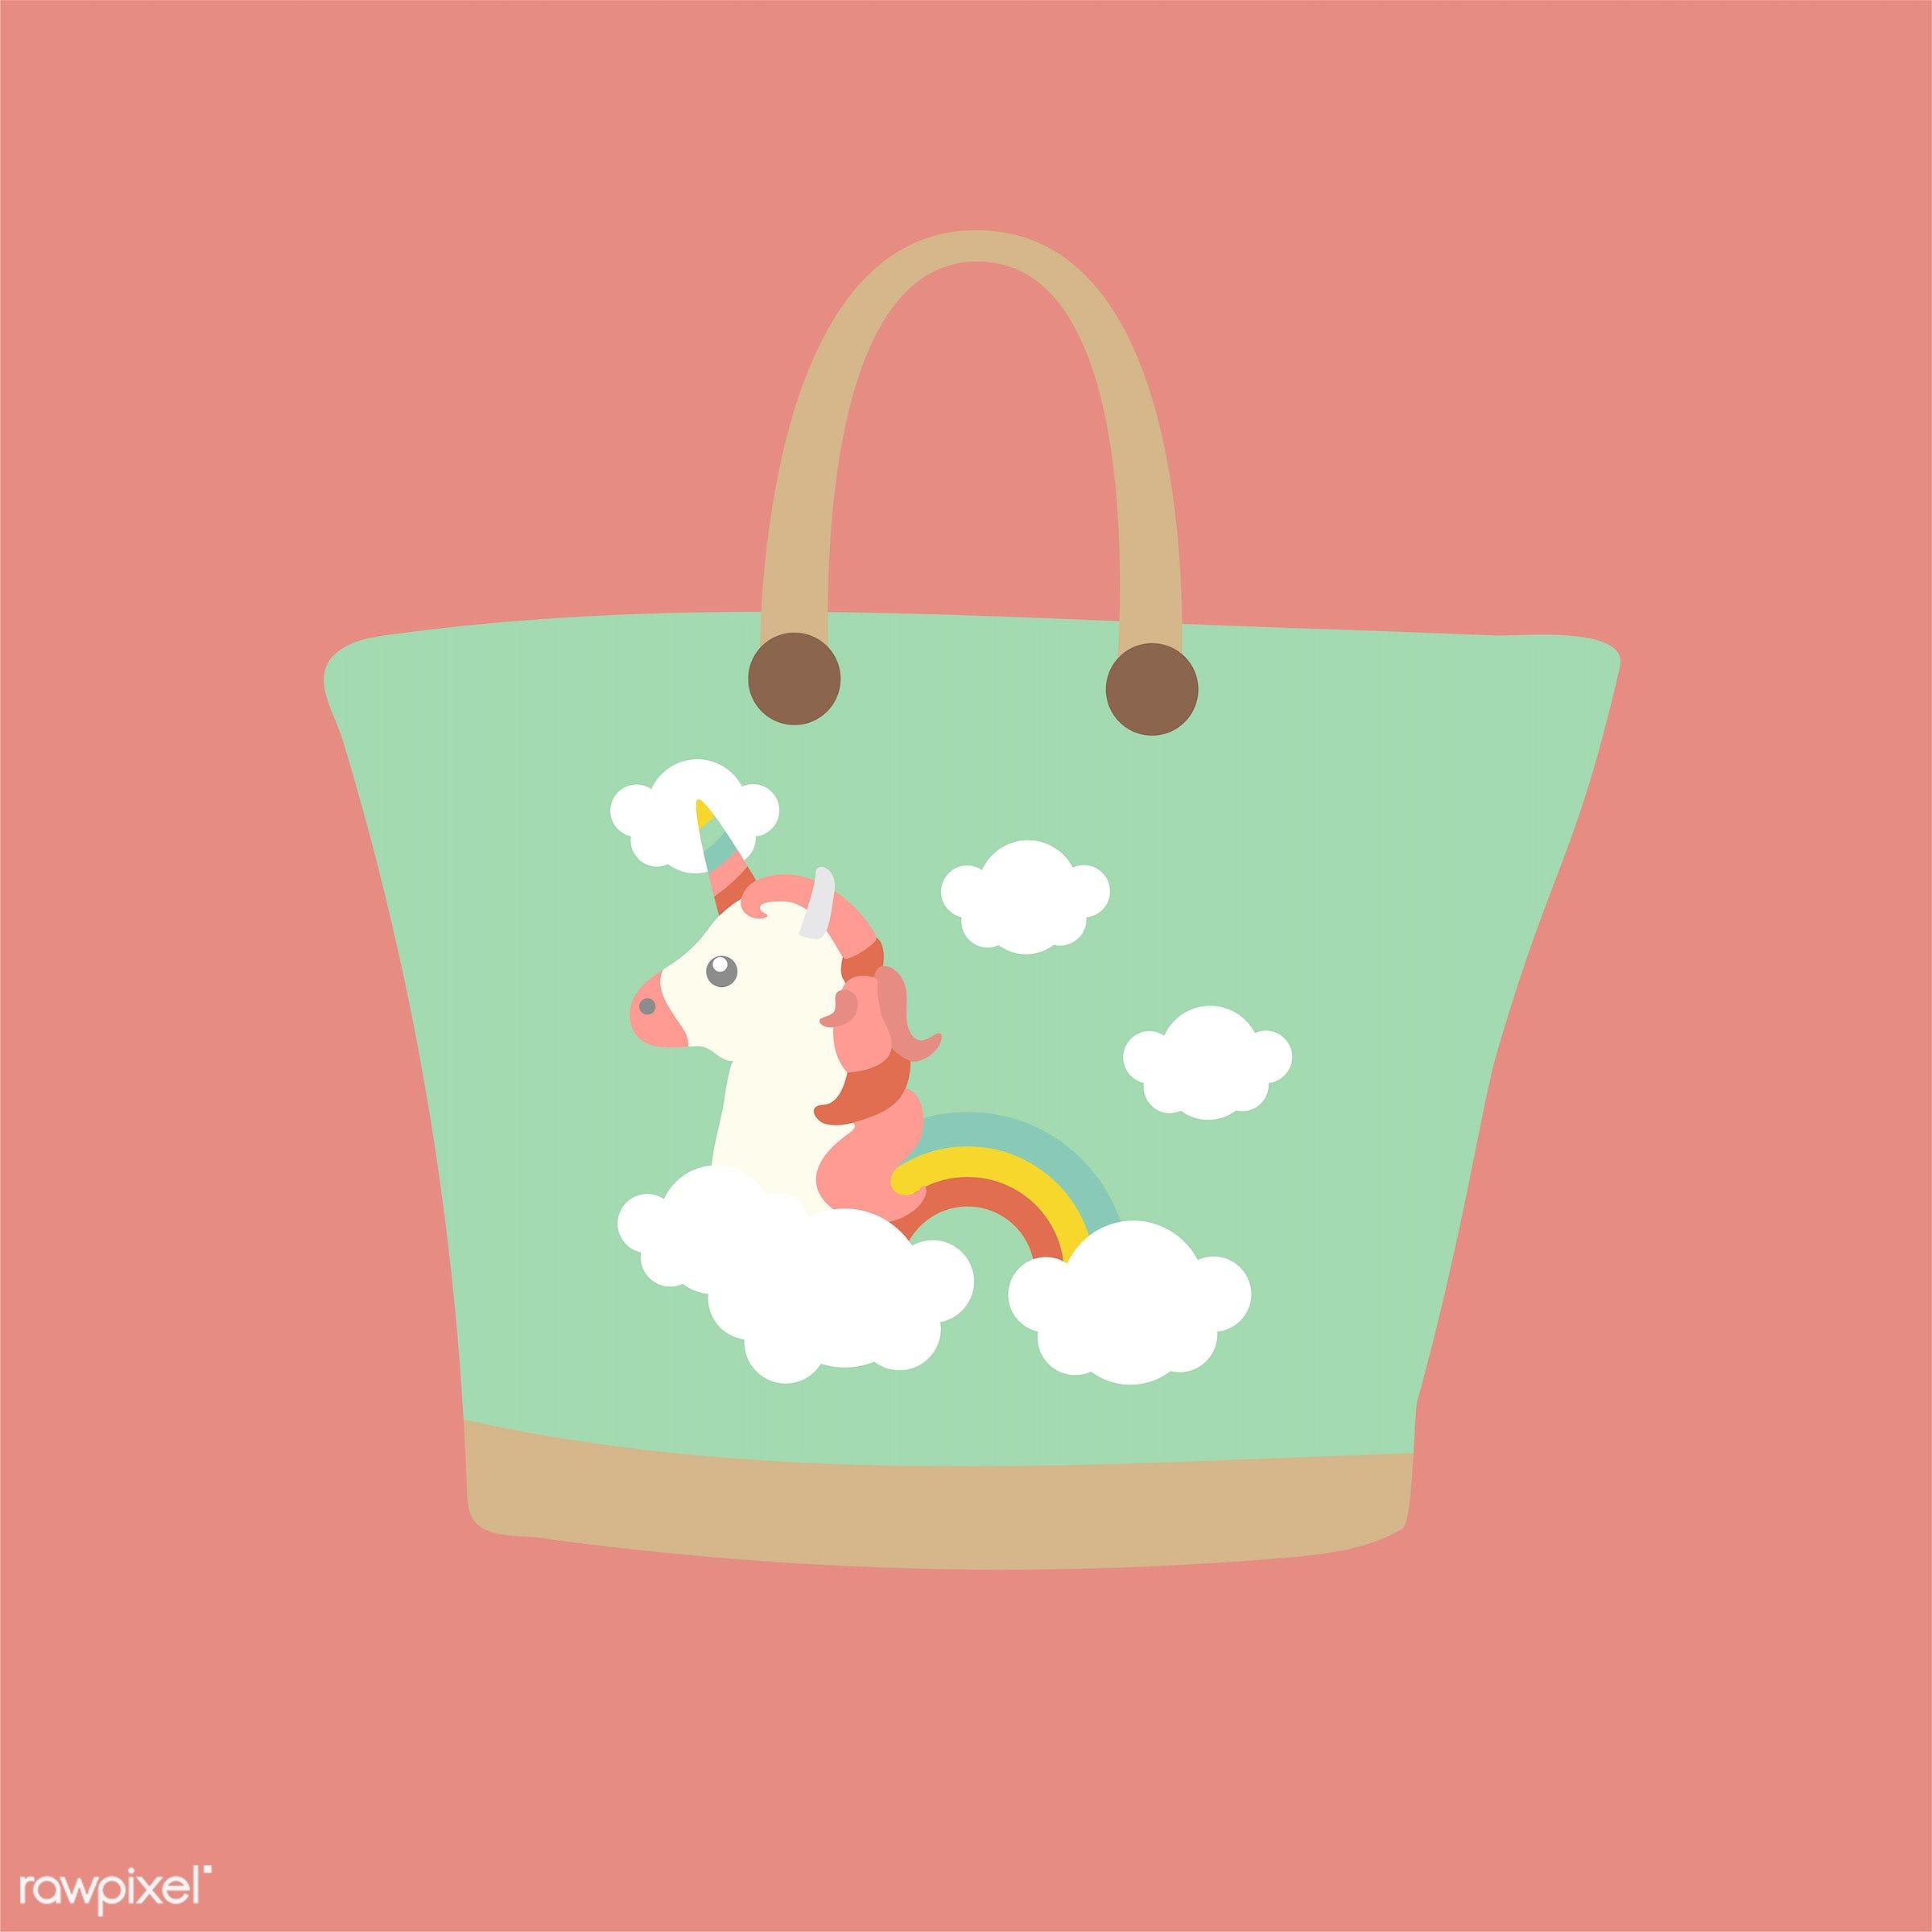 vector, illustration, graphic, cute, sweet, girly, pastel, unicorn, bag, rainbow, beach bag